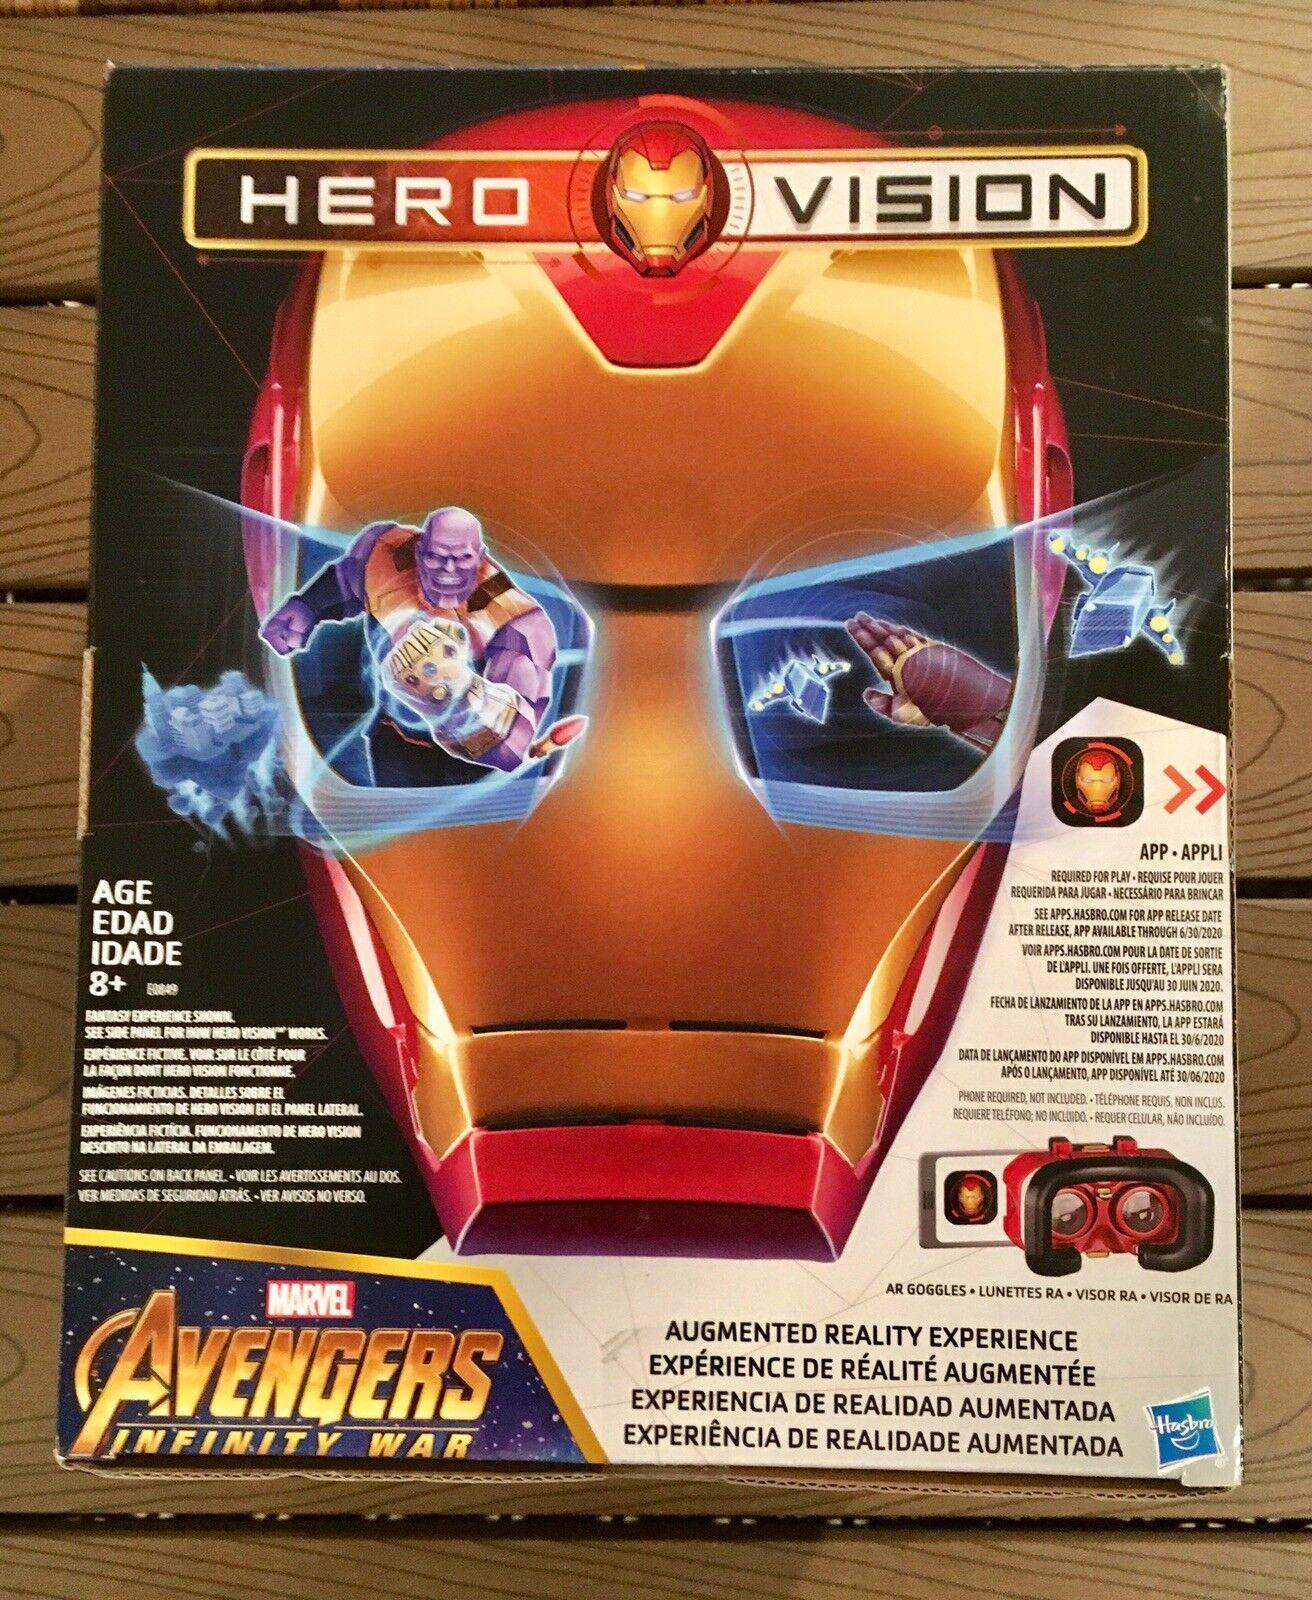 Avengers Infinity War IRON uomo  HELMET Hero Vision AR Experience BRe nuovo   risparmia fino al 70%